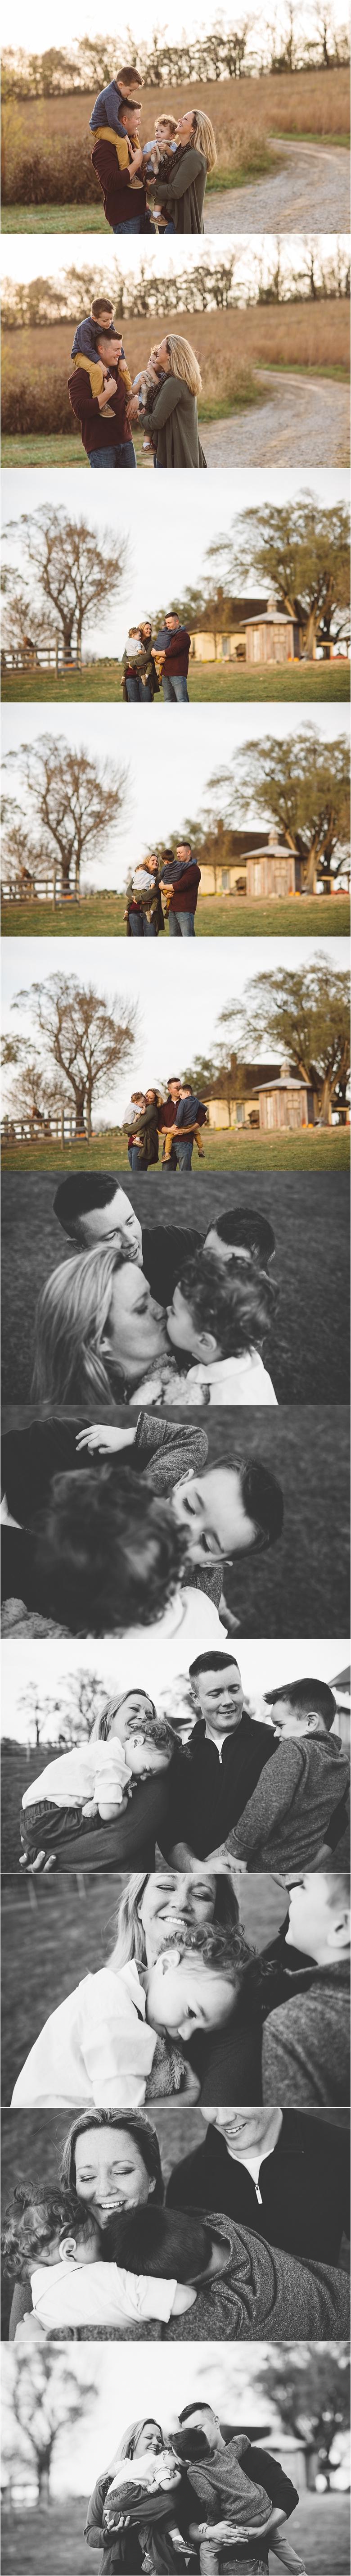 kansascityfamilyphotographer_0034